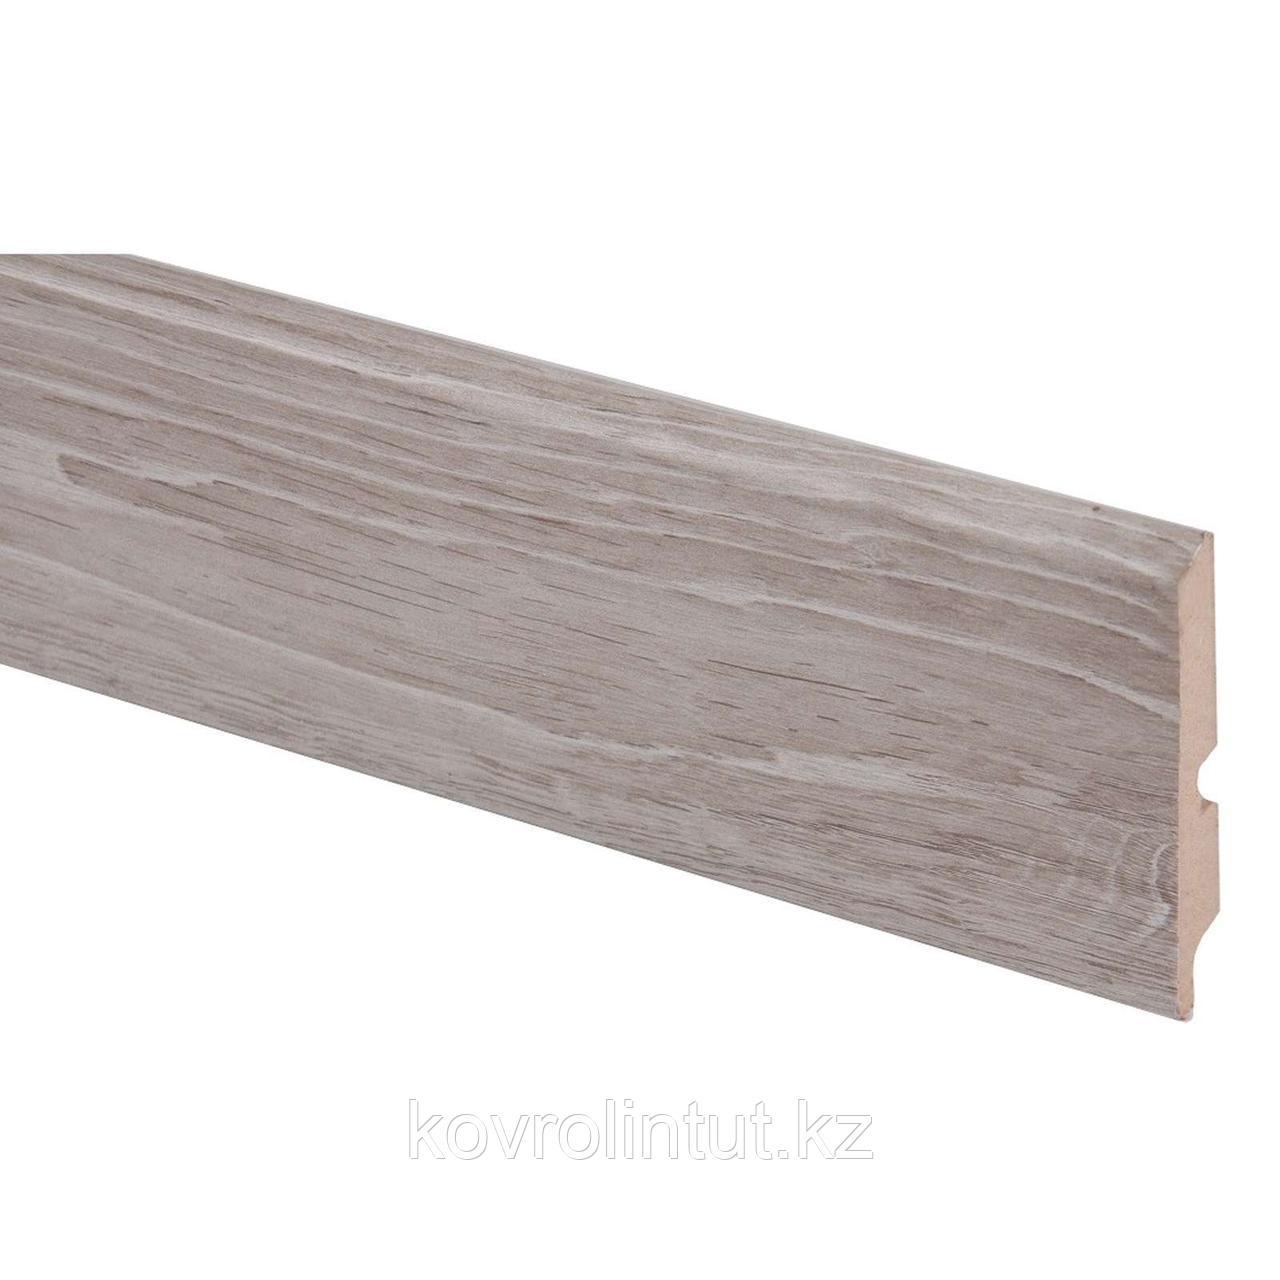 Плинтус Kronopol P85 4922 Downing Oak 2500х85х16мм